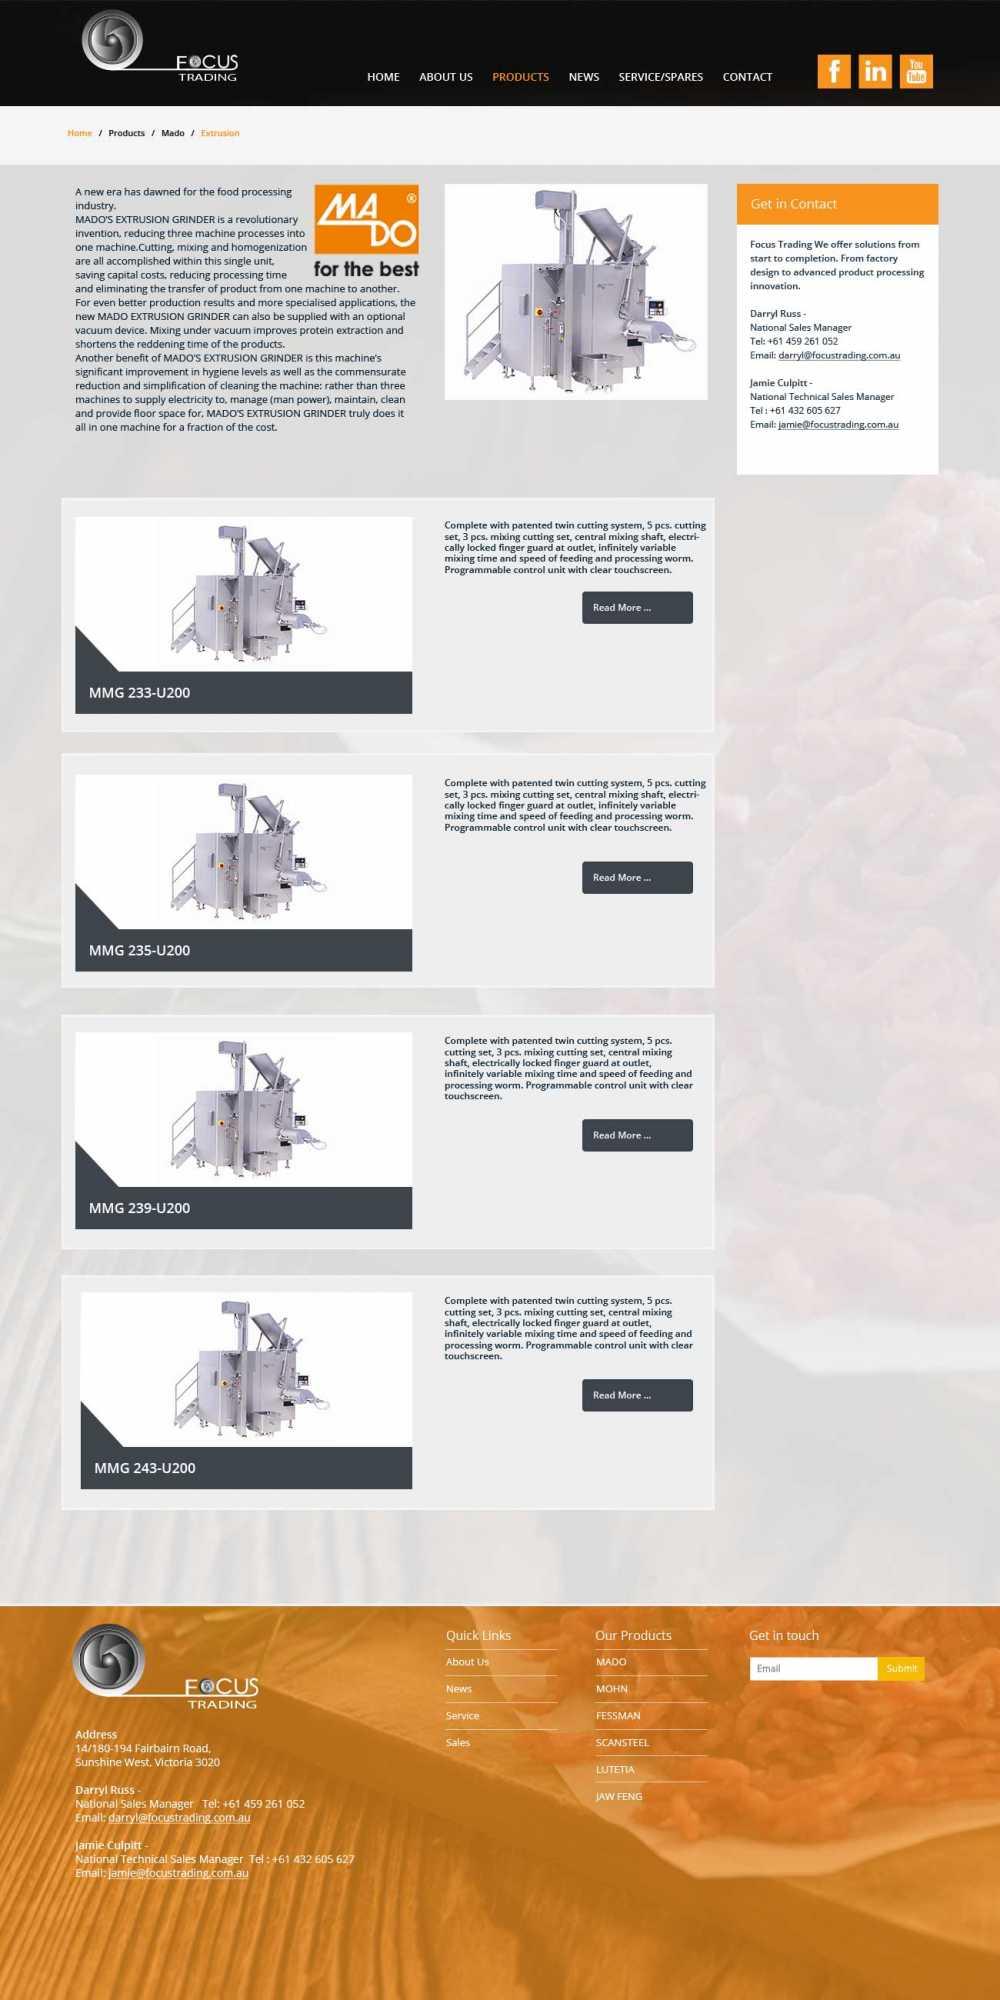 Desktop-SubCategoryPage.jpg